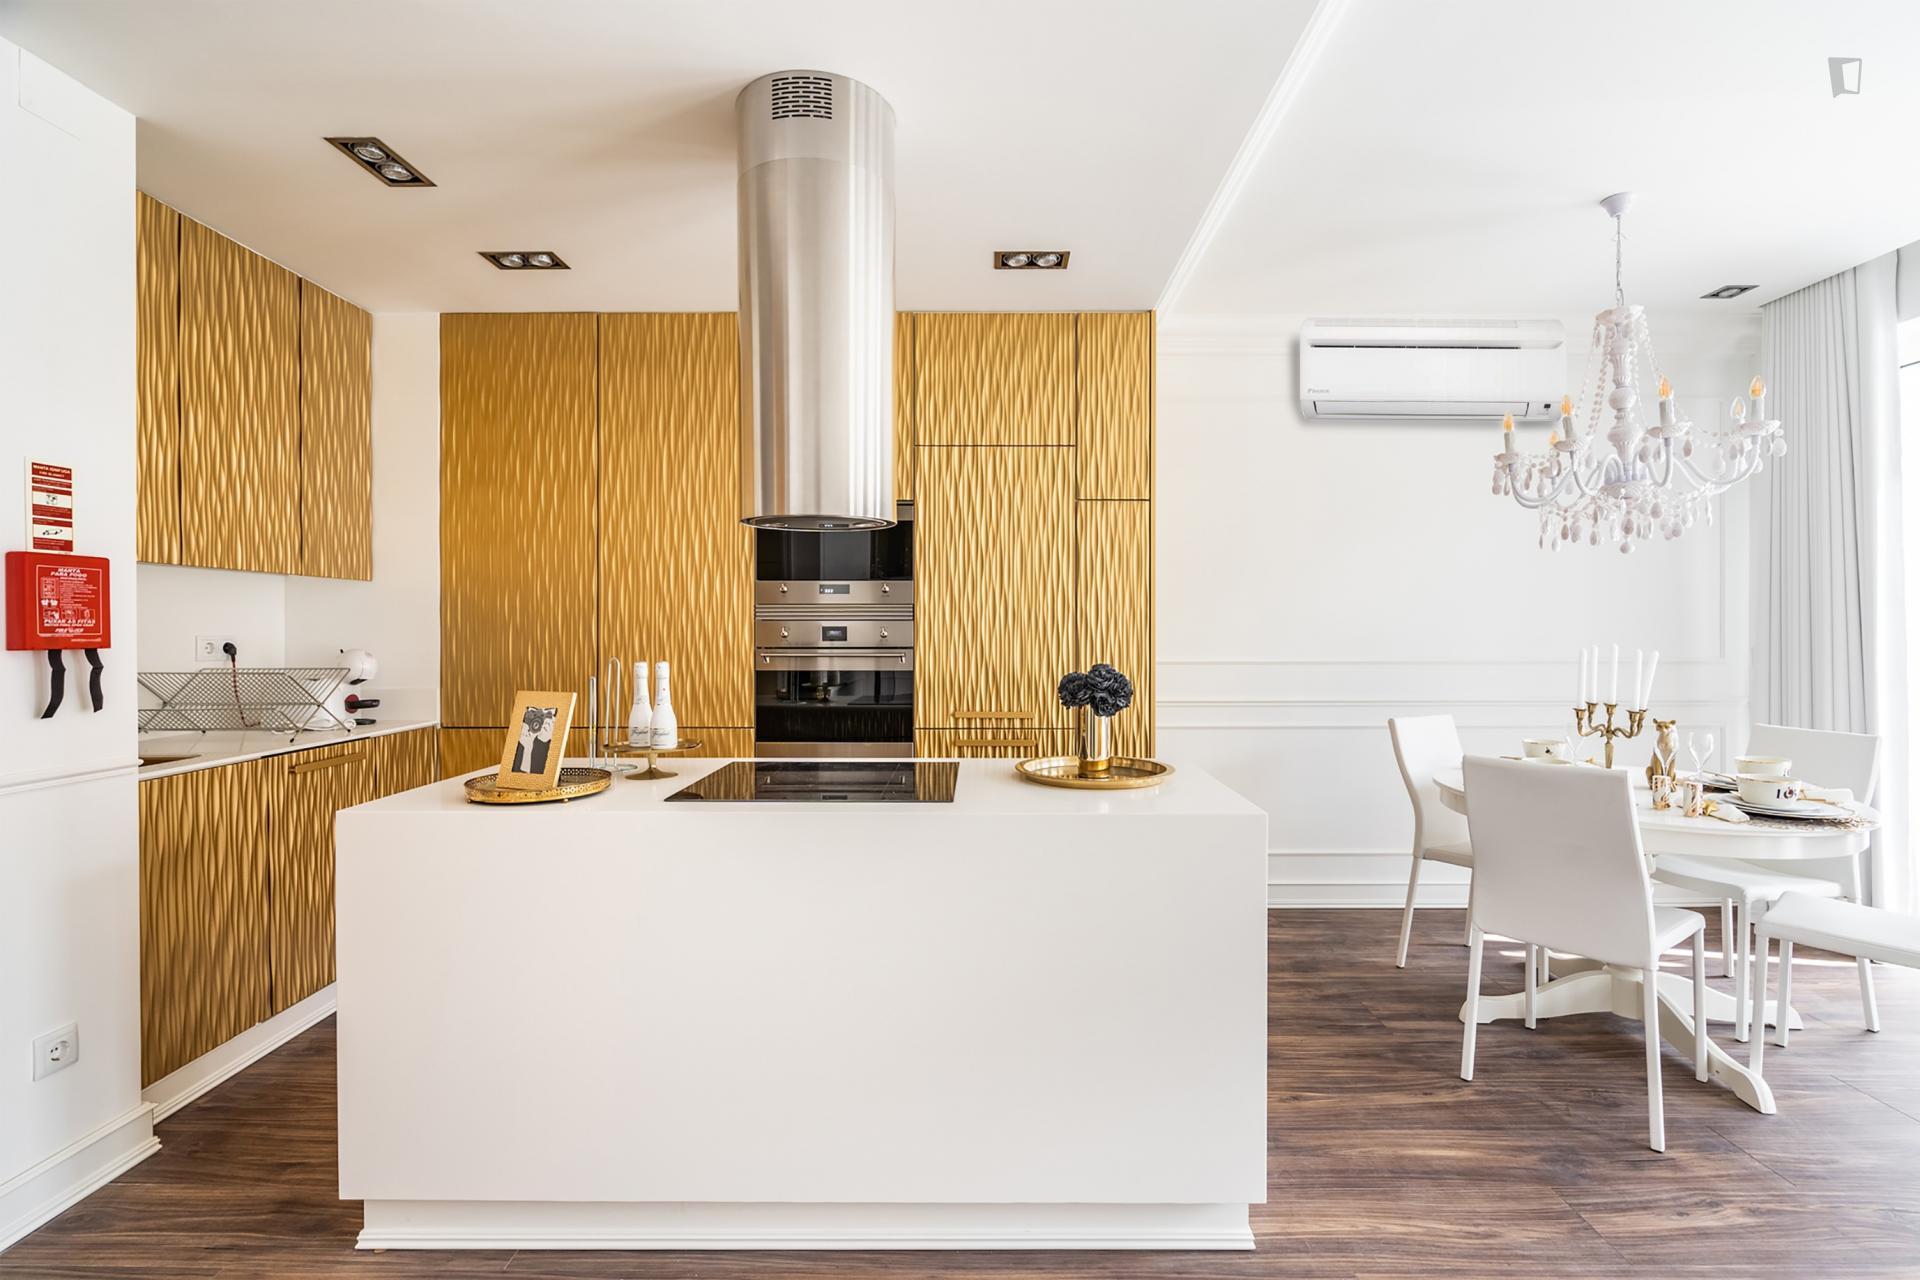 Barbadinhos - 2-bedroom apartment in Lisbon